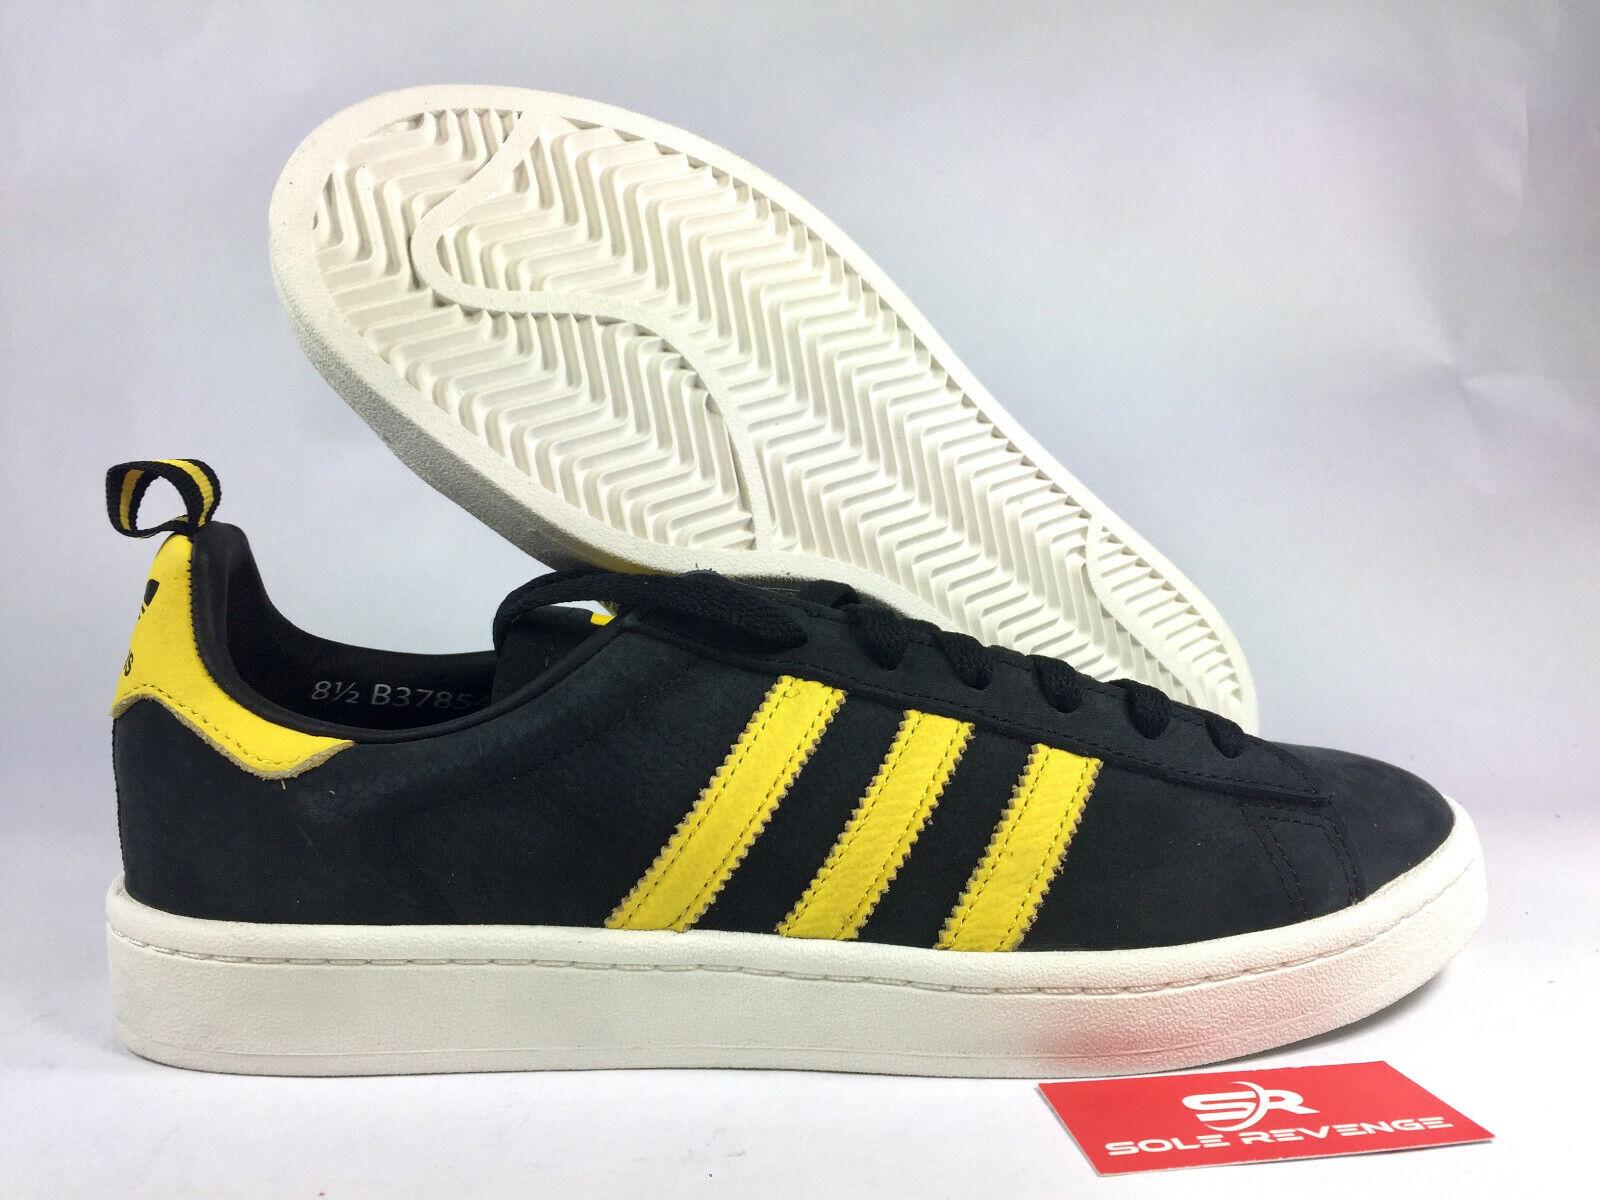 New  adidas Originals CAMPUS SHOES B37854 Core Black Eqt Yellow Chalk White x1